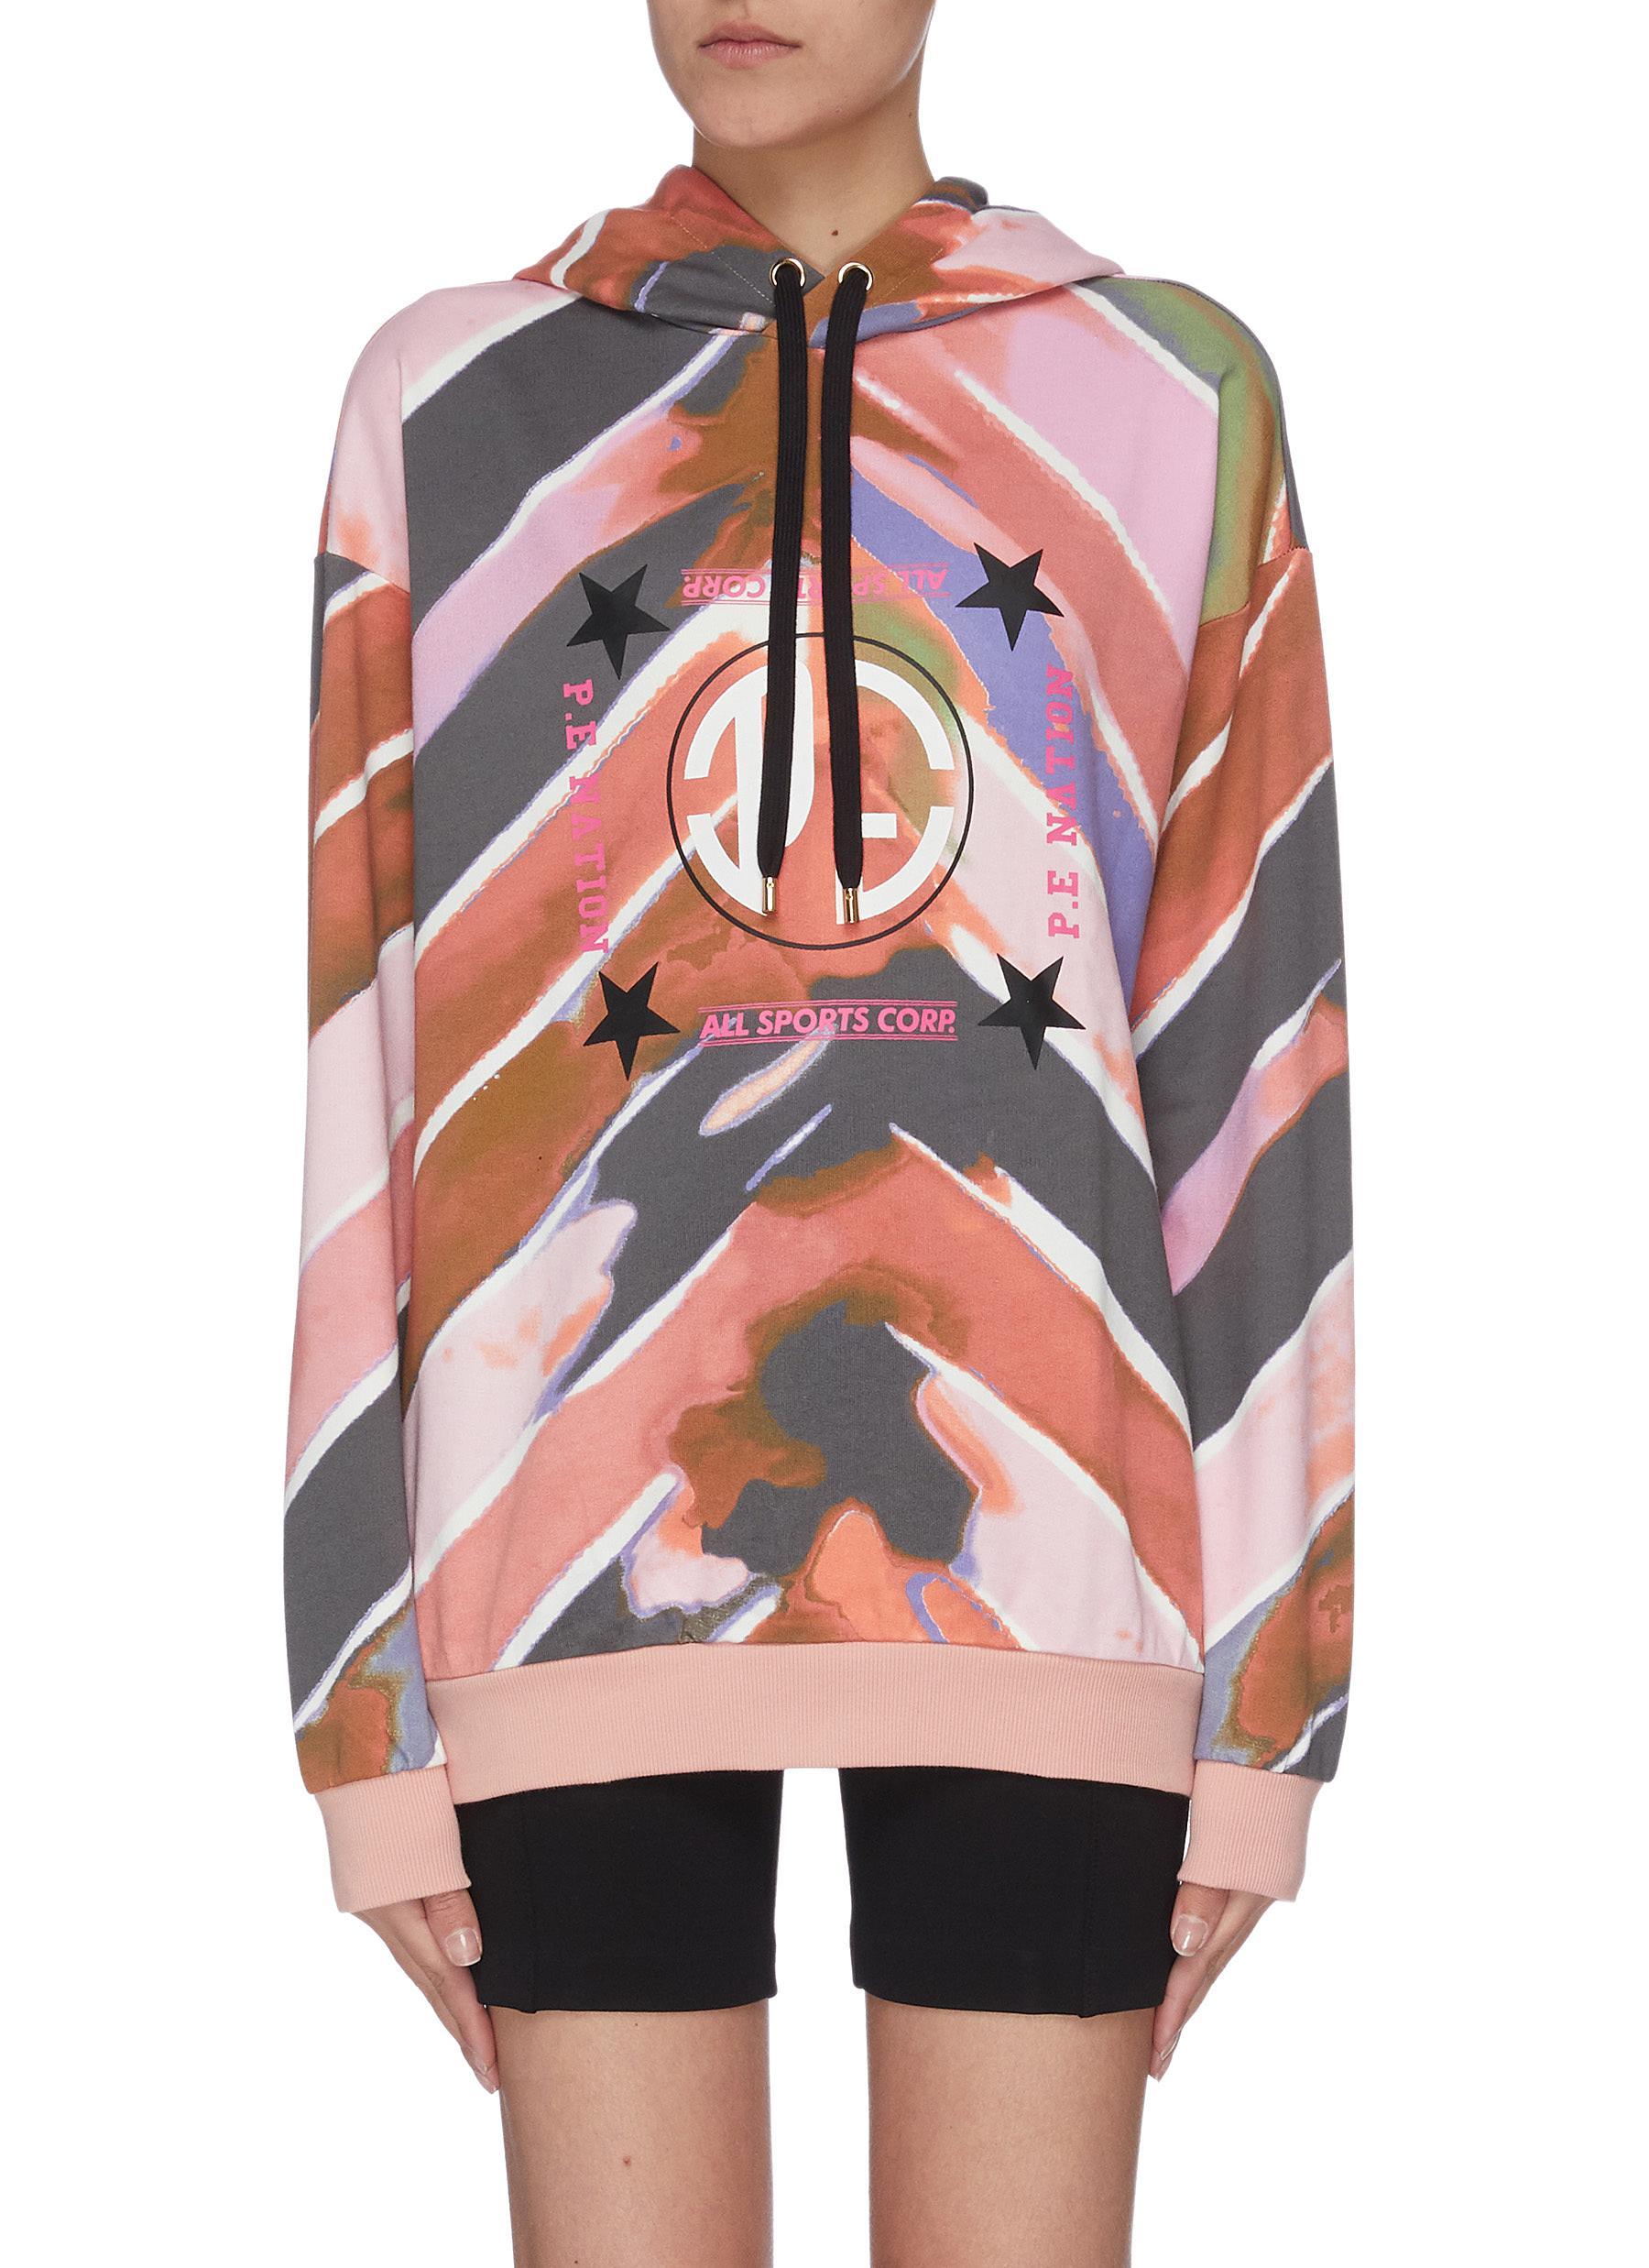 Buy P.E Nation Tops 'Co-driver' tie dye logo hoodie